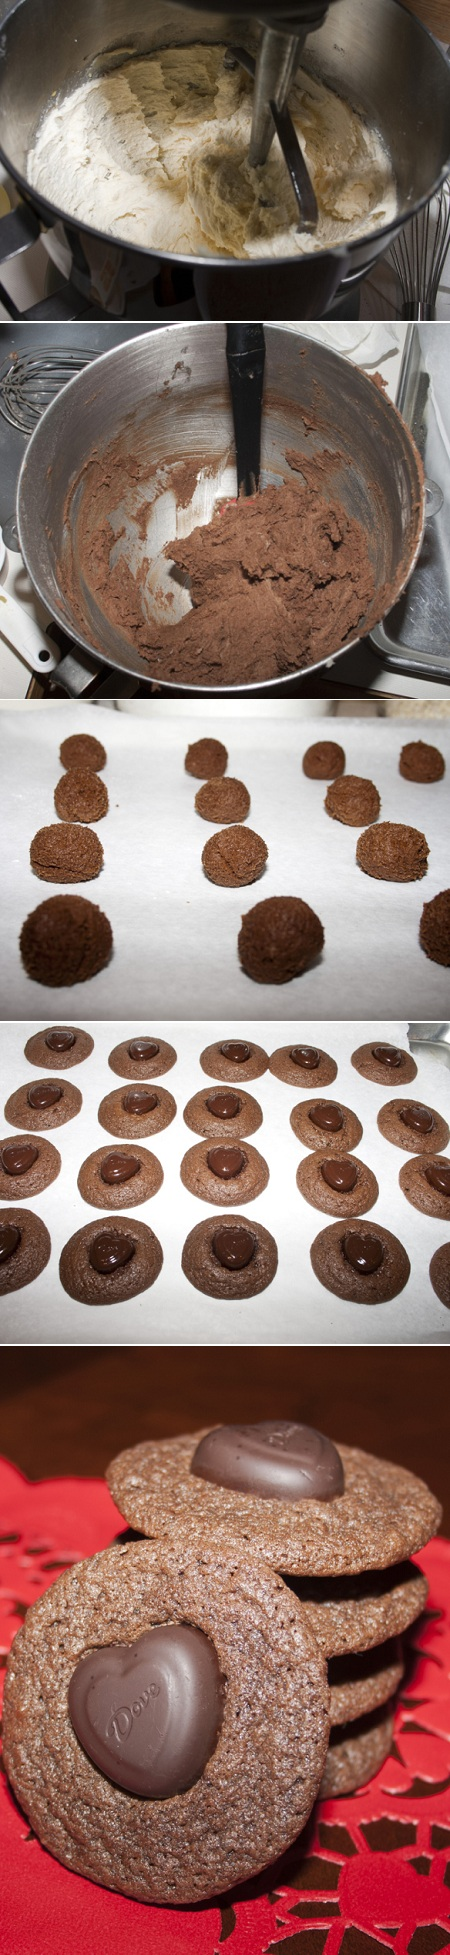 Dark-Chocolate-Chocolate-Cookies